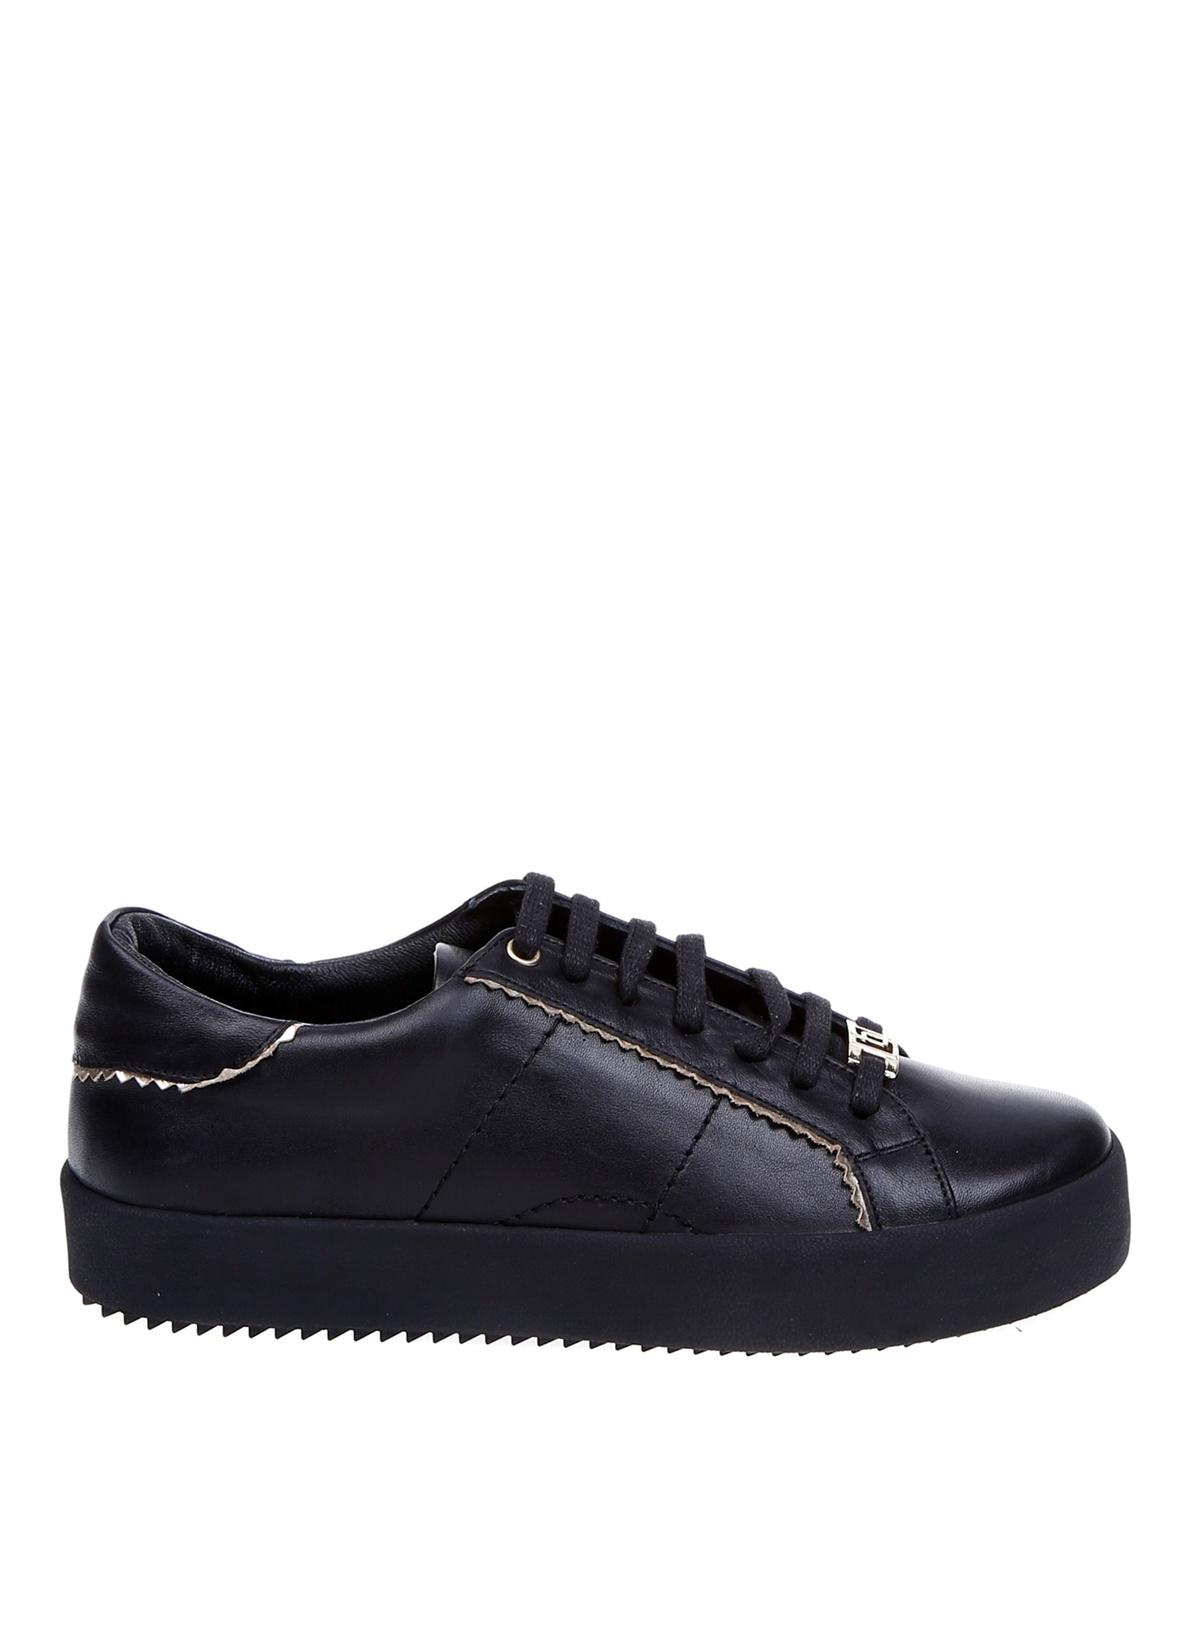 Fabrika Spor Ayakkabı 28-sanov Fabrika Koşu Ayakkabısı – 250.0 TL